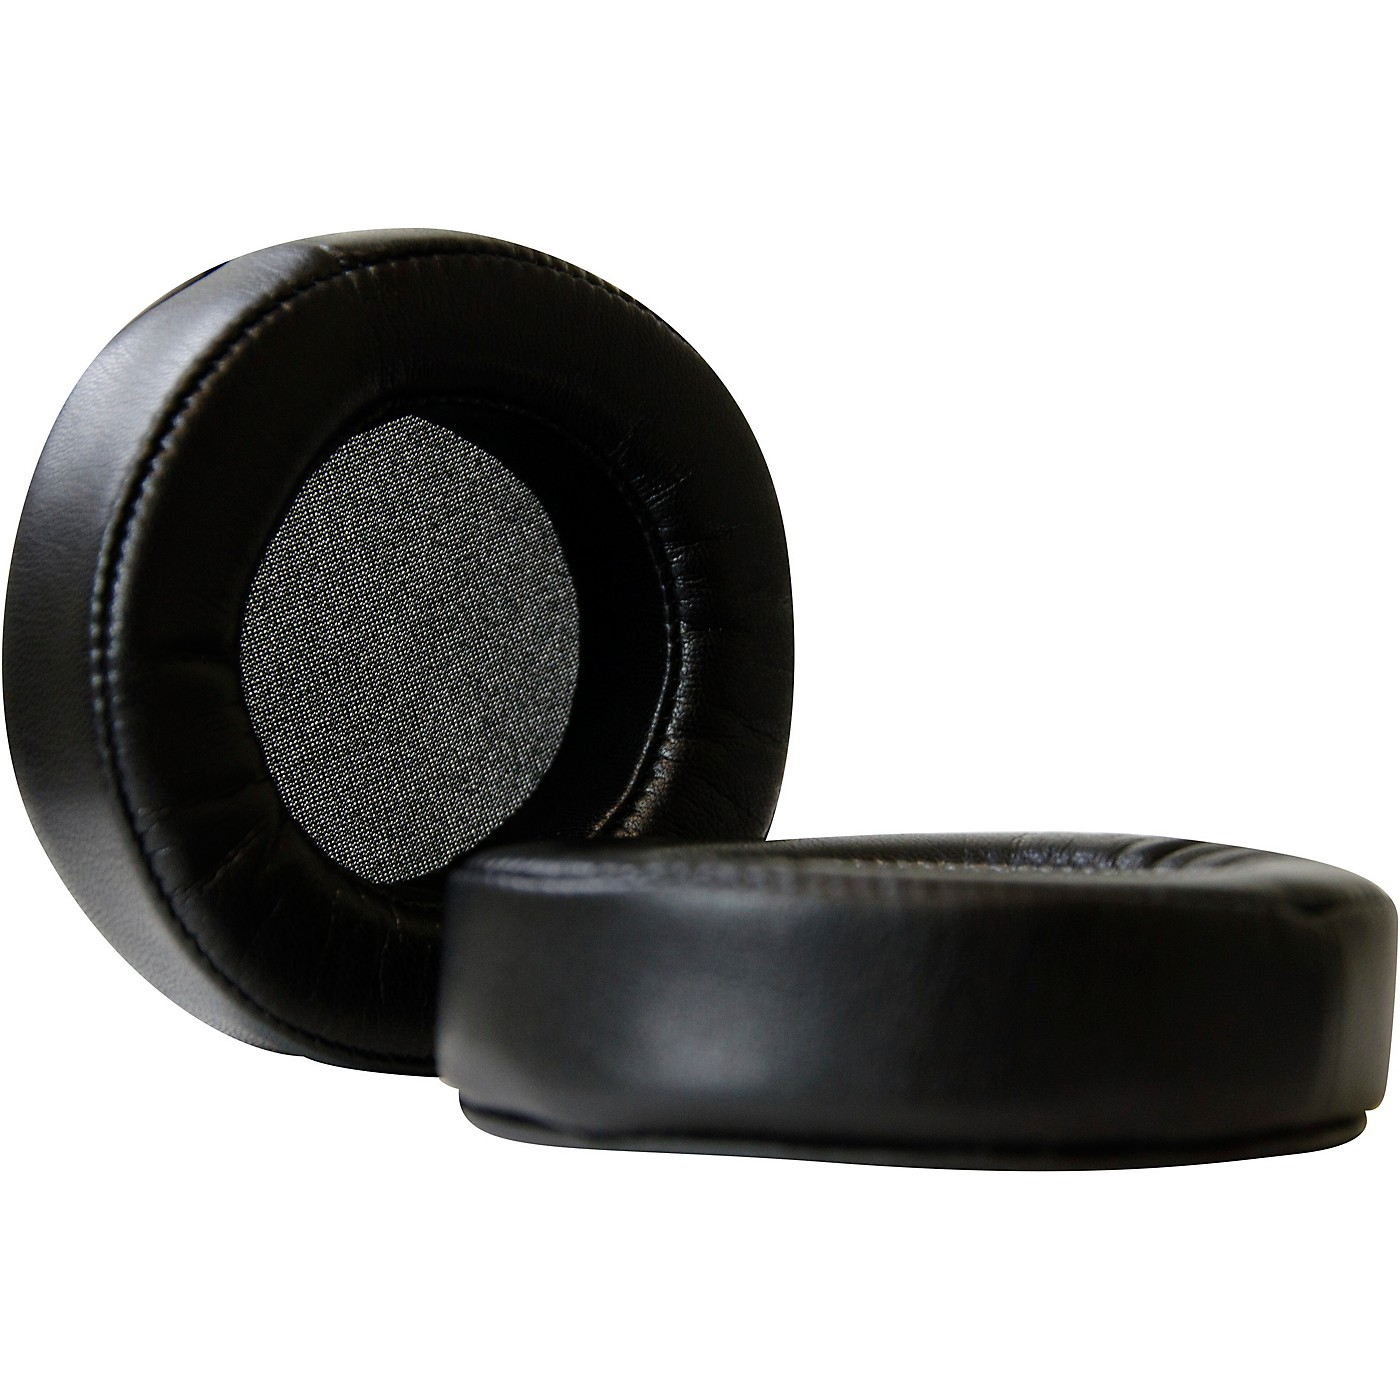 Dekoni Audio Choice Leather Replacement Ear Pads for Beyerdynamic DT and AKG K Series Headphones thumbnail